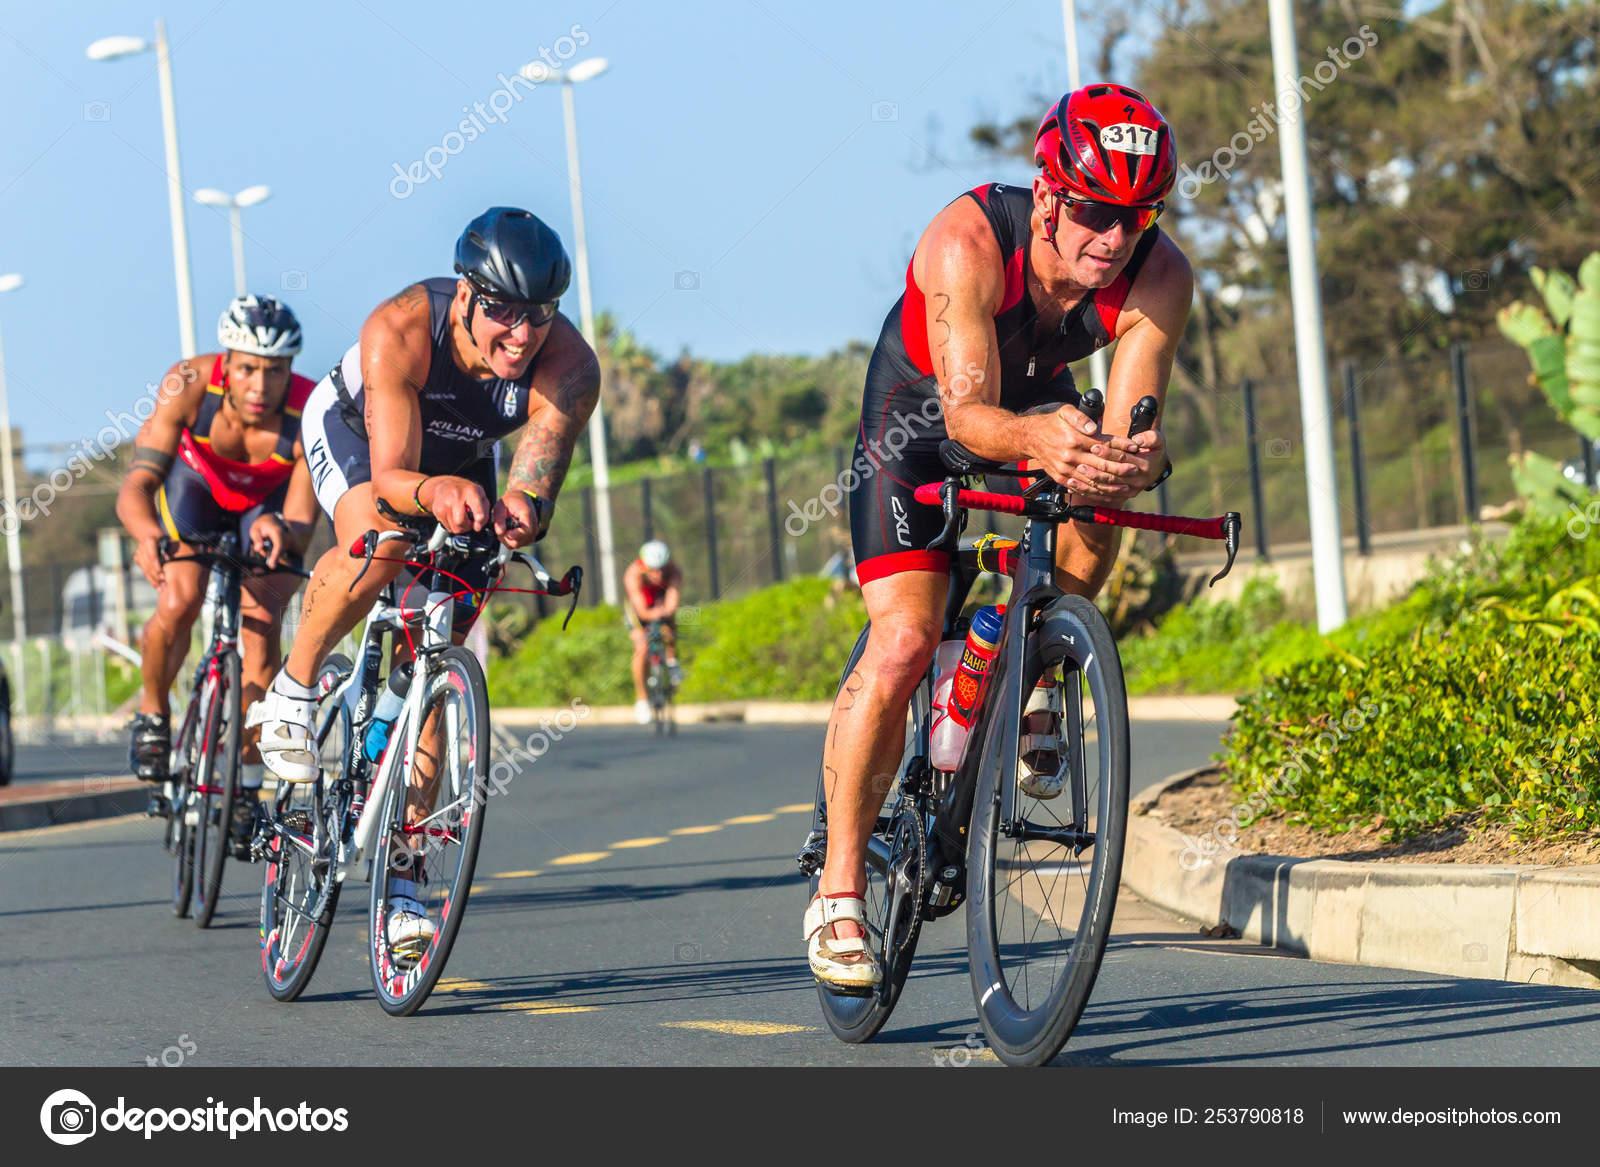 Triathlon Champs Athlete Men Cycling Road Course – Stock